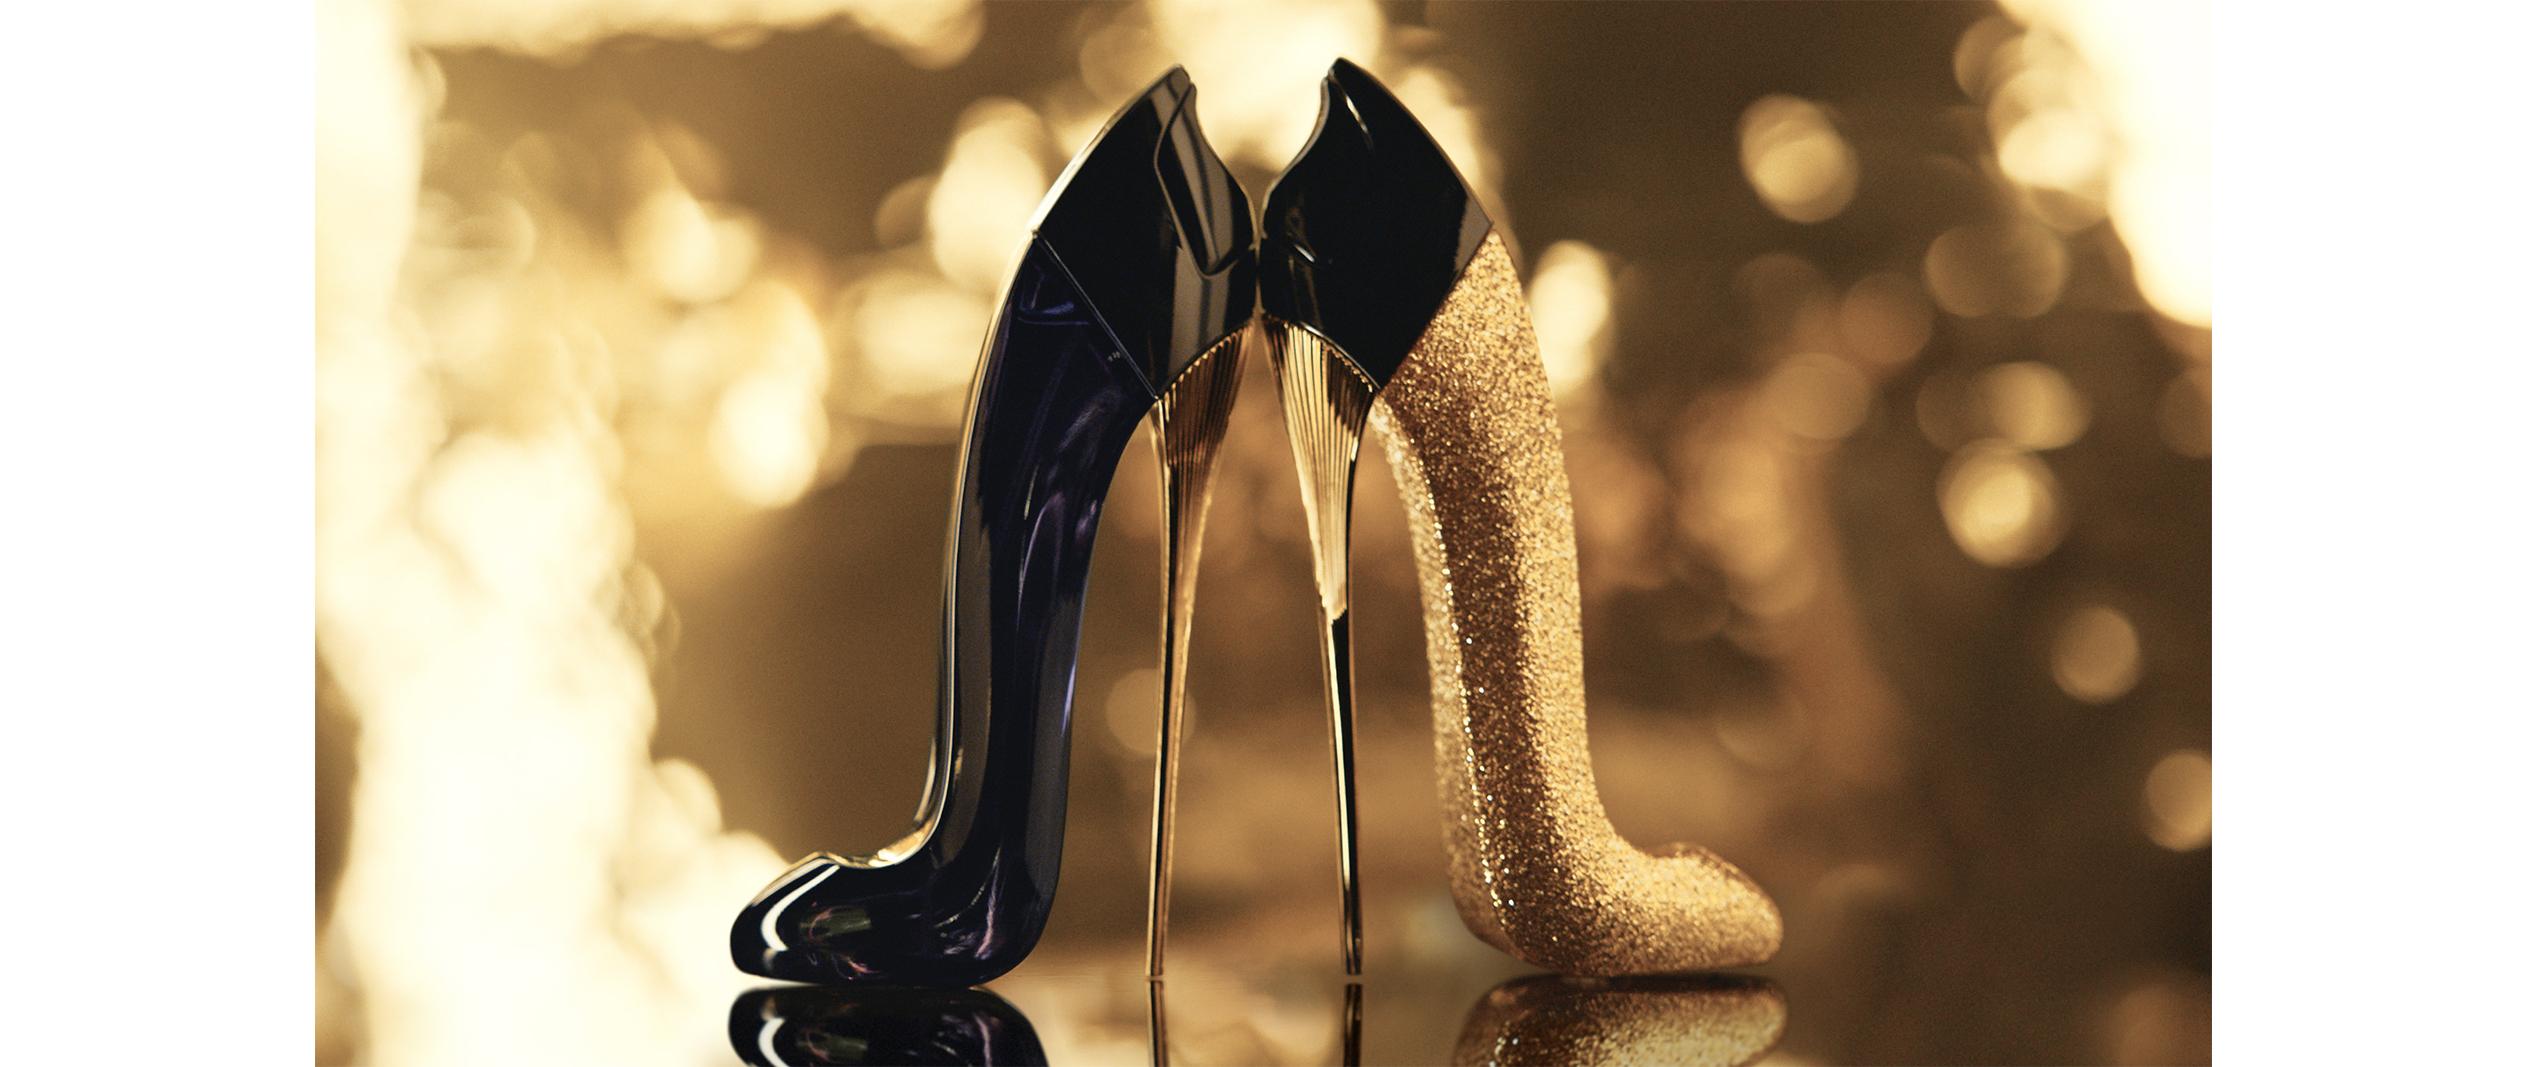 Good Girl Glorious Gold, el zapatito dorado de Carolina Herrera, edición limitada de coleccionista, perfume con forma de zapato dorado